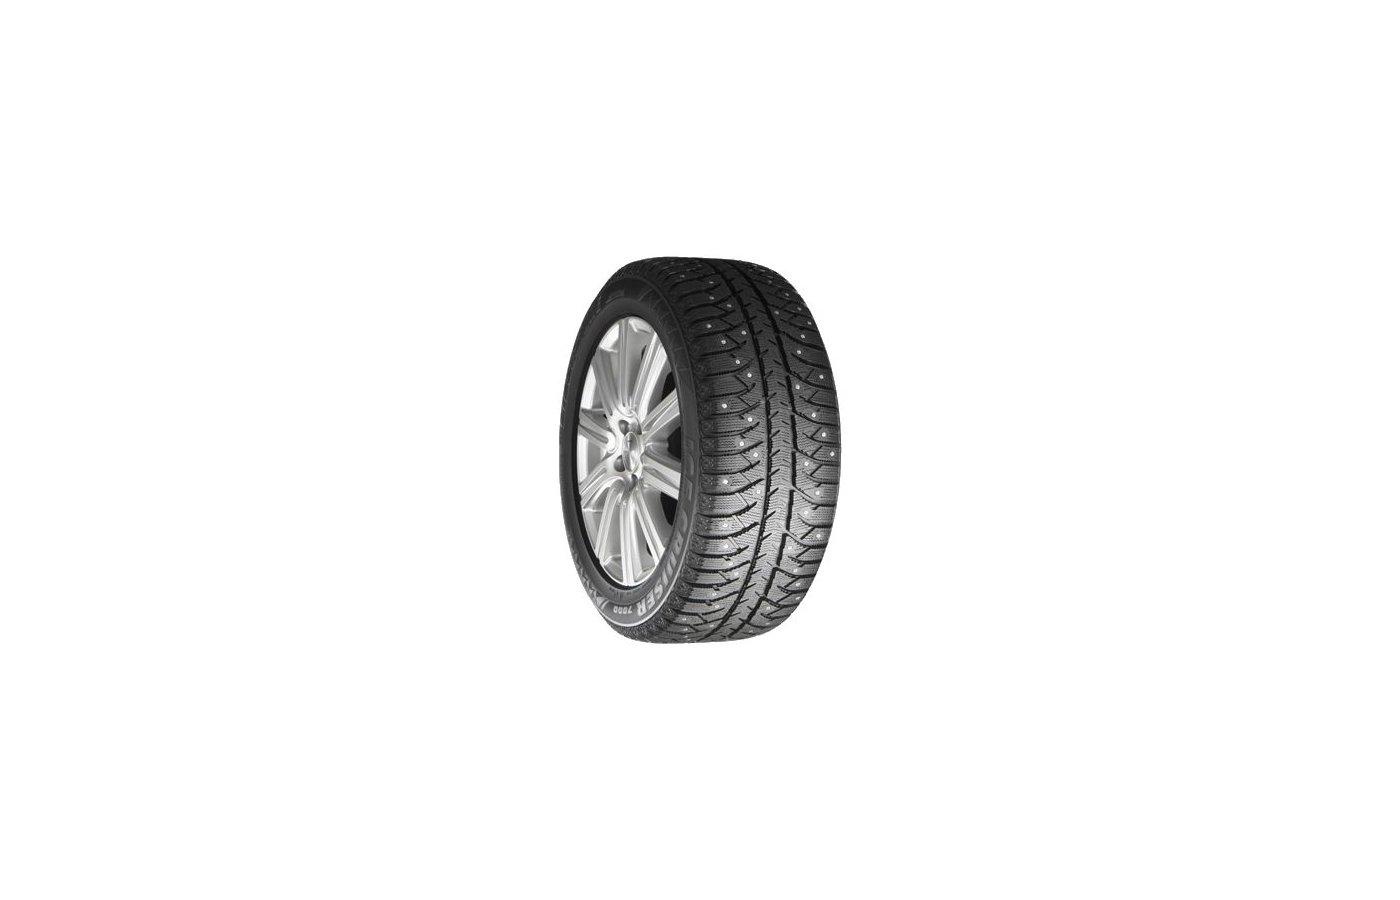 Шина Bridgestone Ice Cruiser 7000 225/65 R17 TL 106T XL шип